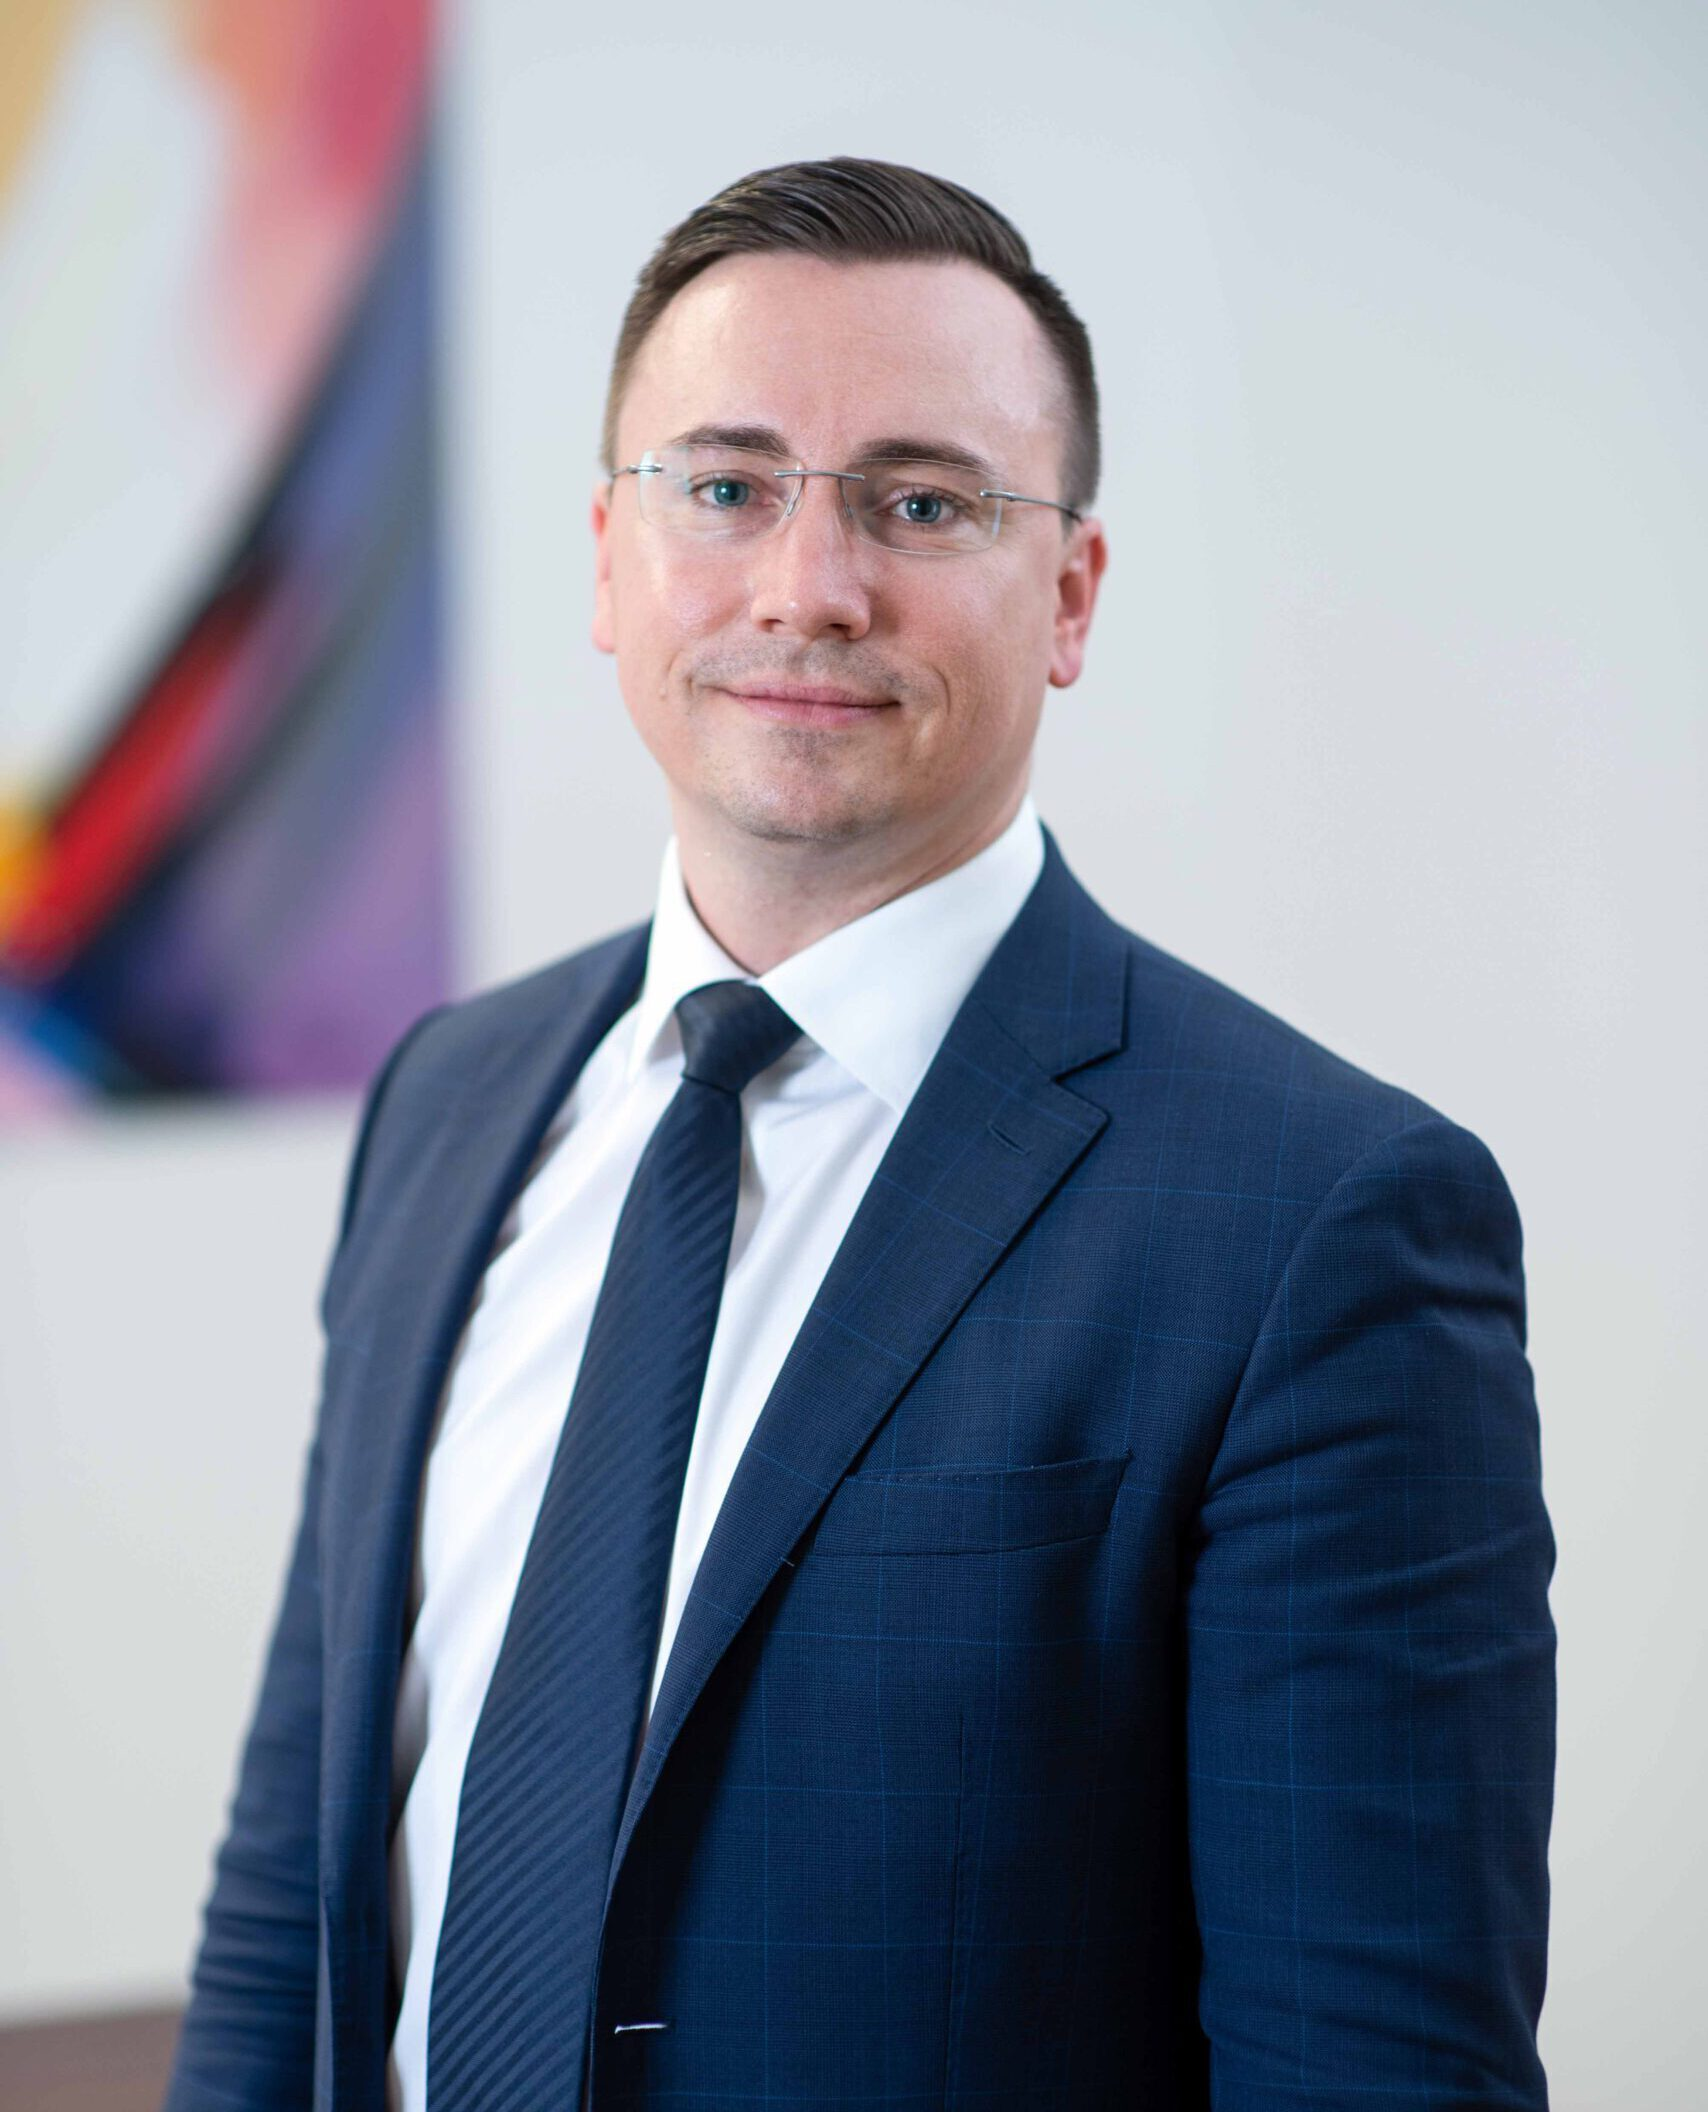 Rechtsanwalt Aleksej Ermolenko (KAYP)